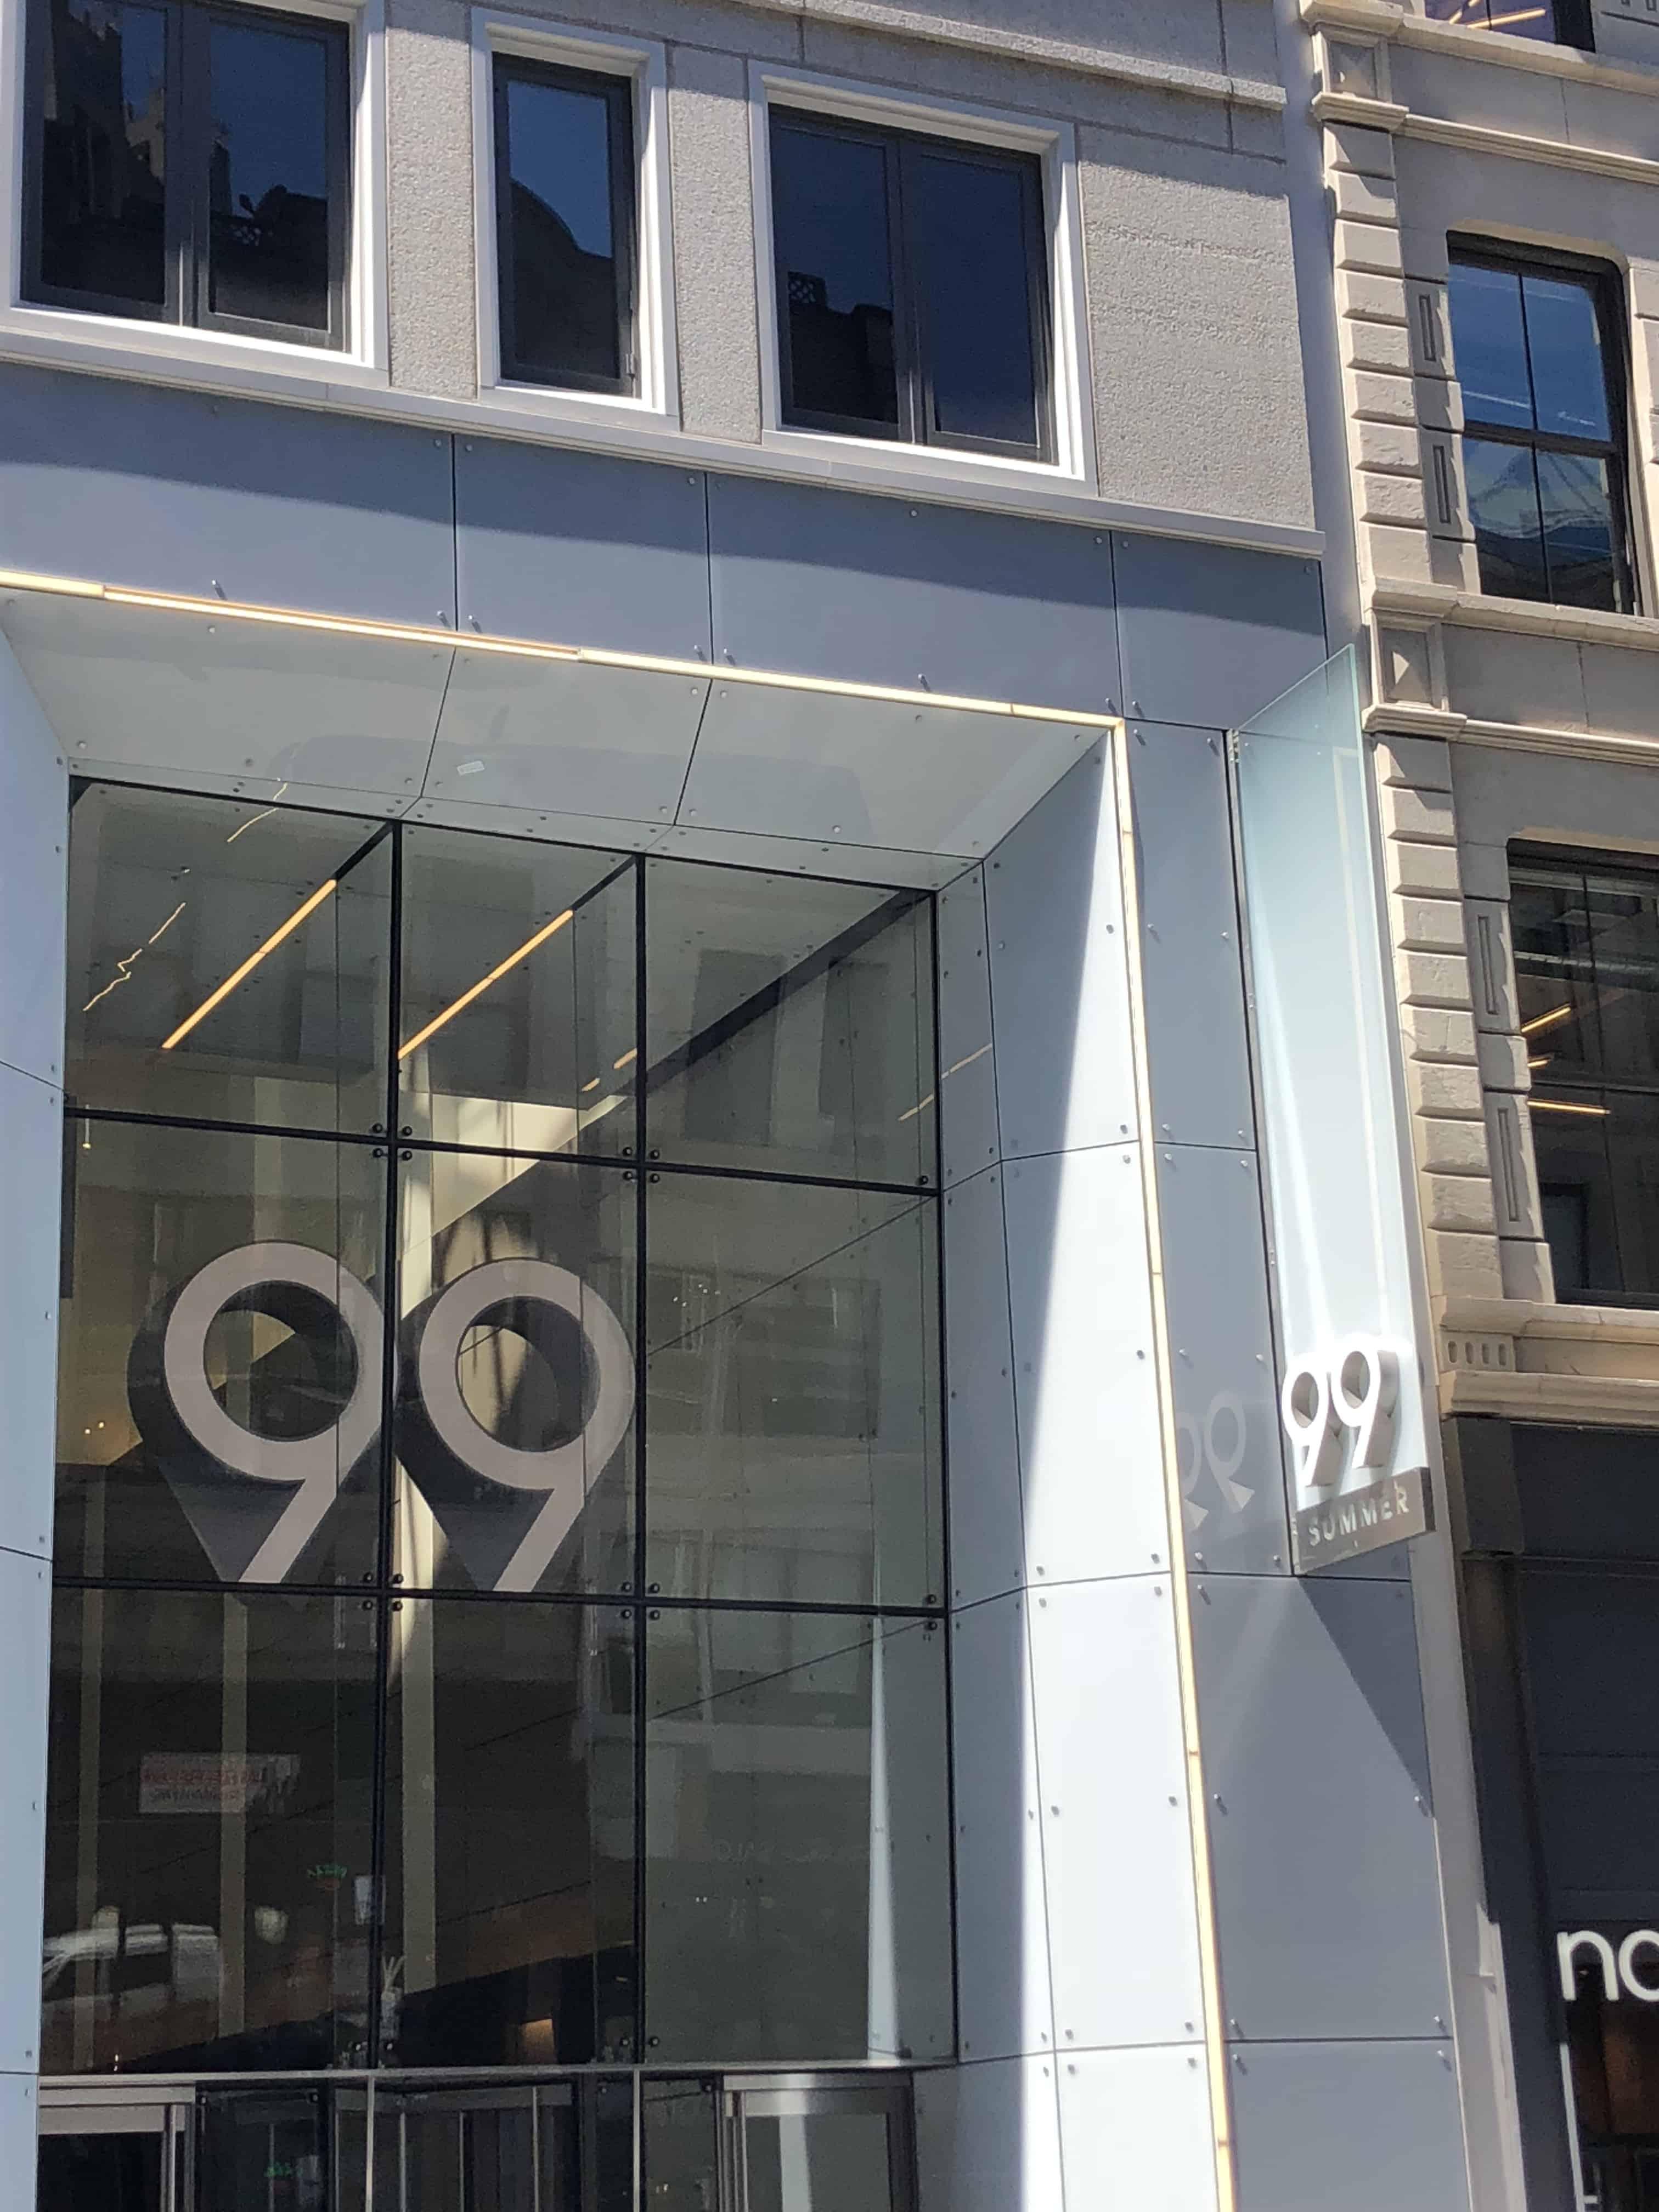 99 Summer Entrance